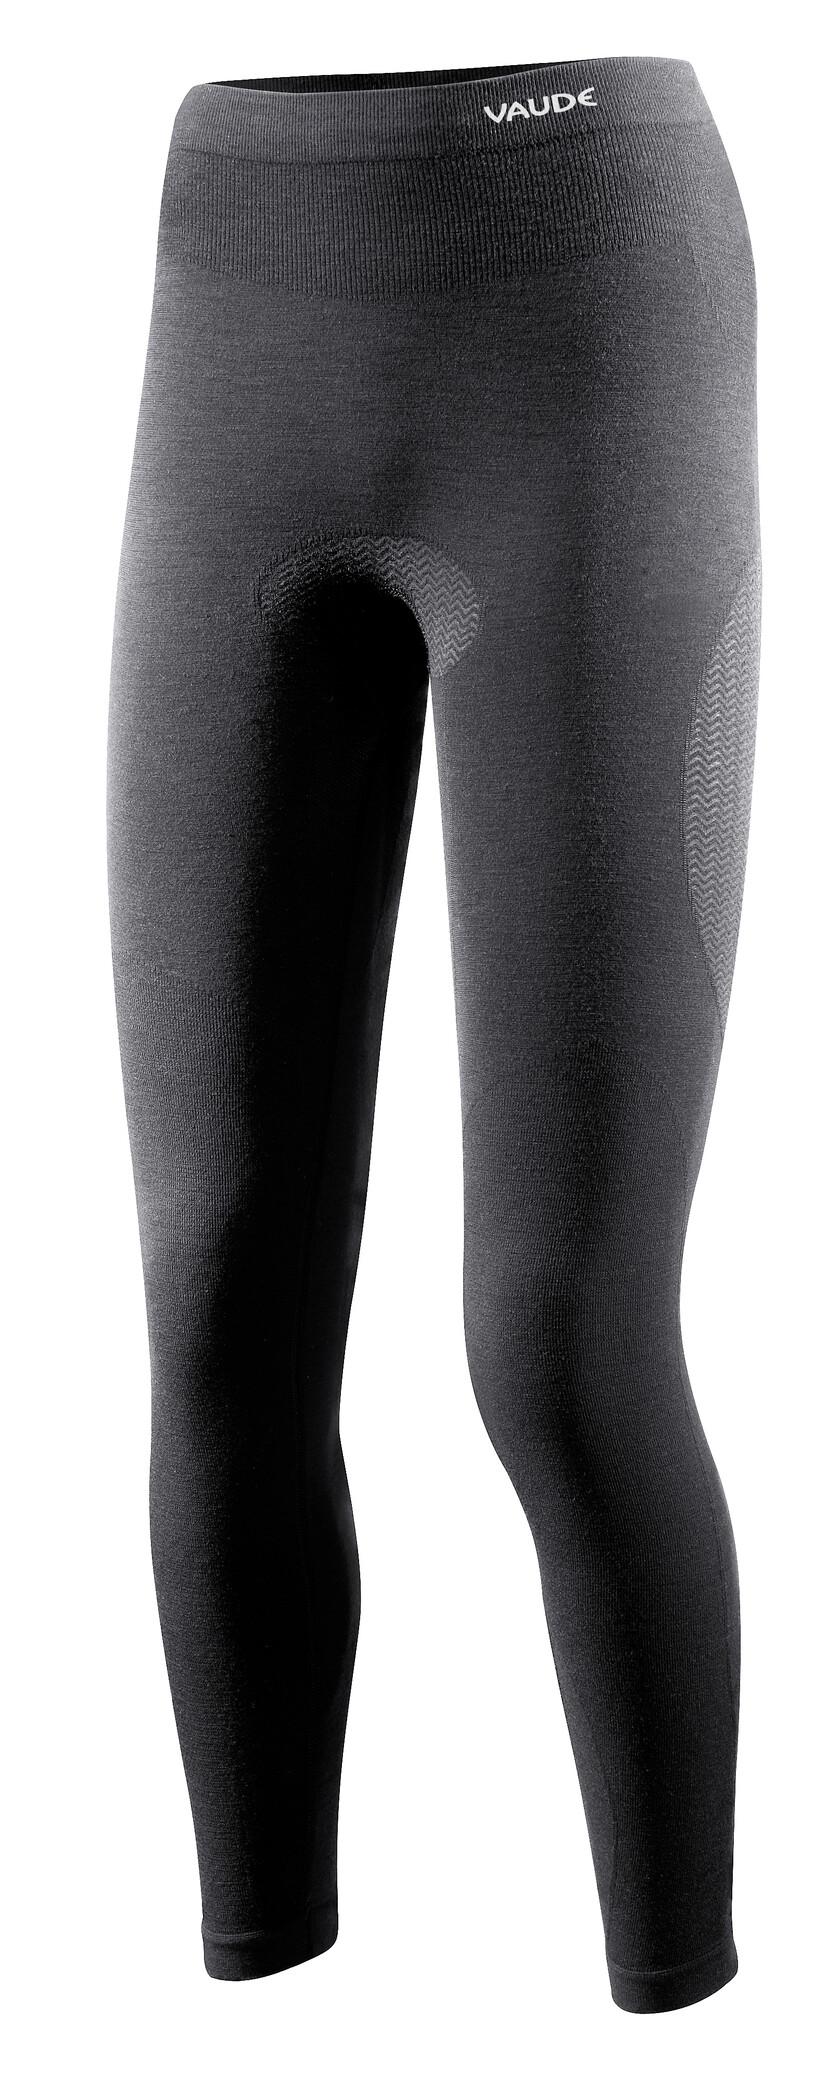 Vaude Seamless Tights Women's black 44 outdoorunterwäsche~outdoor merino~unterwäsche merinowolle